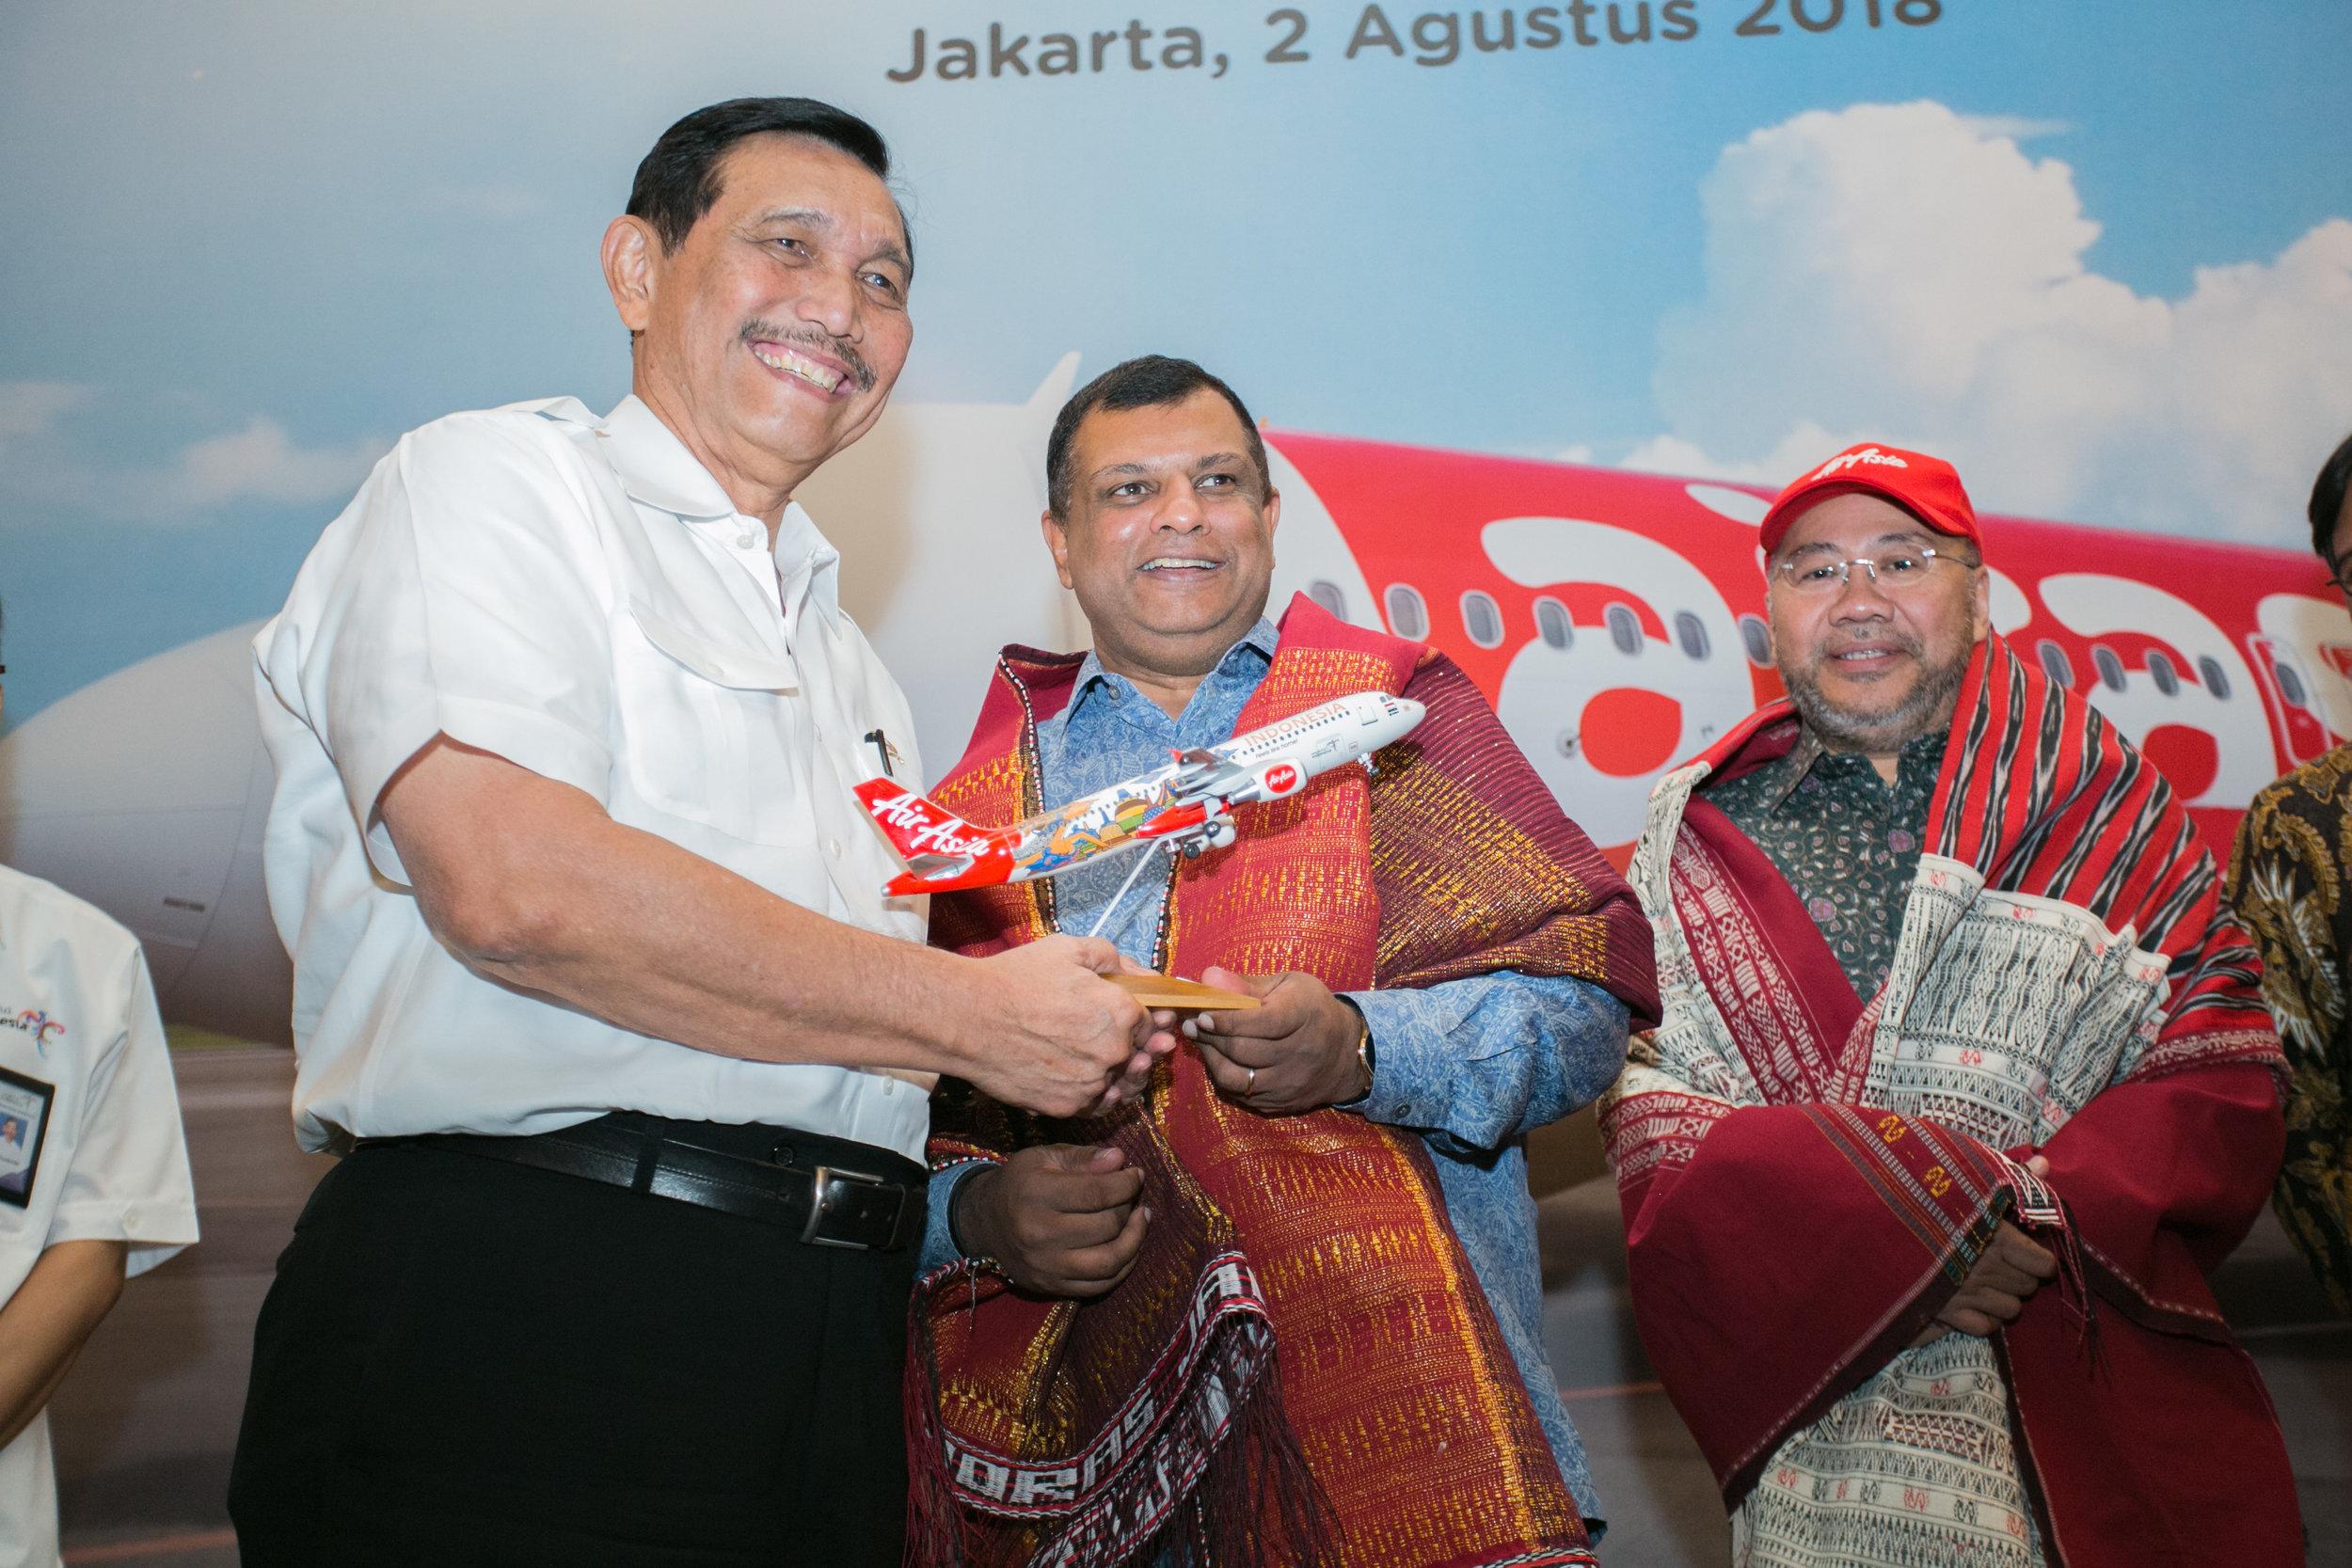 Photo caption:  (From Left) Luhut Binsar Pandjaitan, Coordinating Minister for Maritime Affairs Indonesia, Tan Sri Tony Fernandes, AirAsia Group CEO and Datuk Kamarudin Meranun, AirAsia Group Berhad Executive Chairman and AirAsia X Co-Group CEO at the launch of AirAsia's new route from Kuala Lumpur - Silangit - Lake Toba.